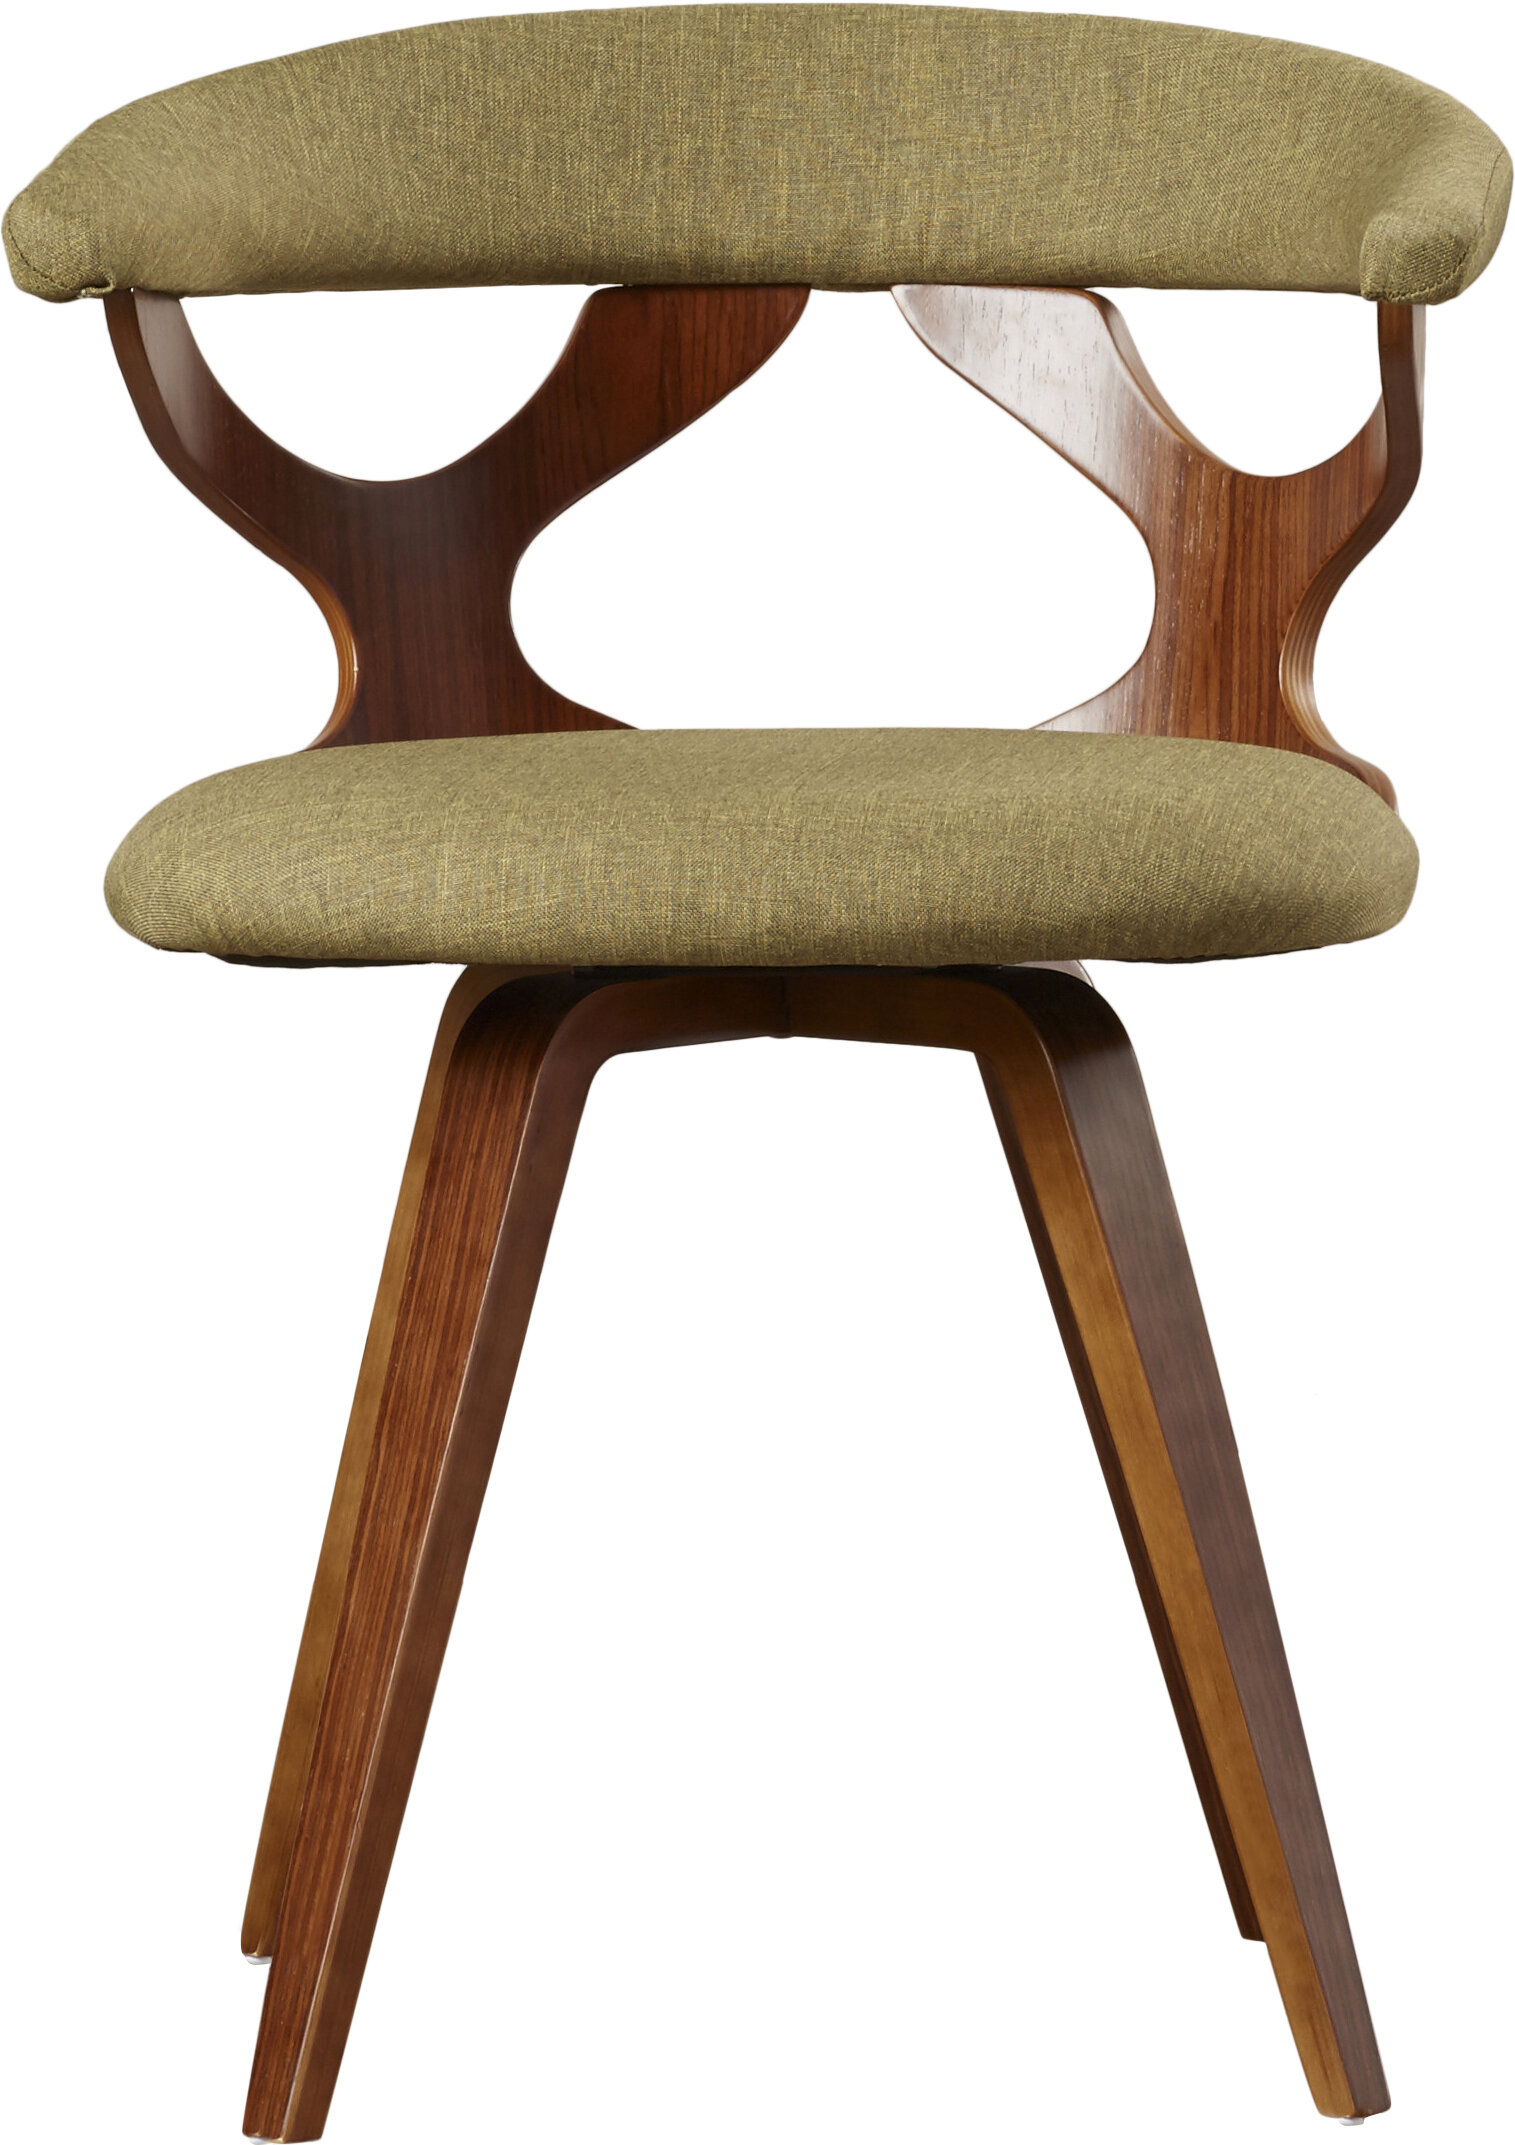 Awe Inspiring Langley Street Altigarron Swivel Side Chair Reviews Wayfair Andrewgaddart Wooden Chair Designs For Living Room Andrewgaddartcom